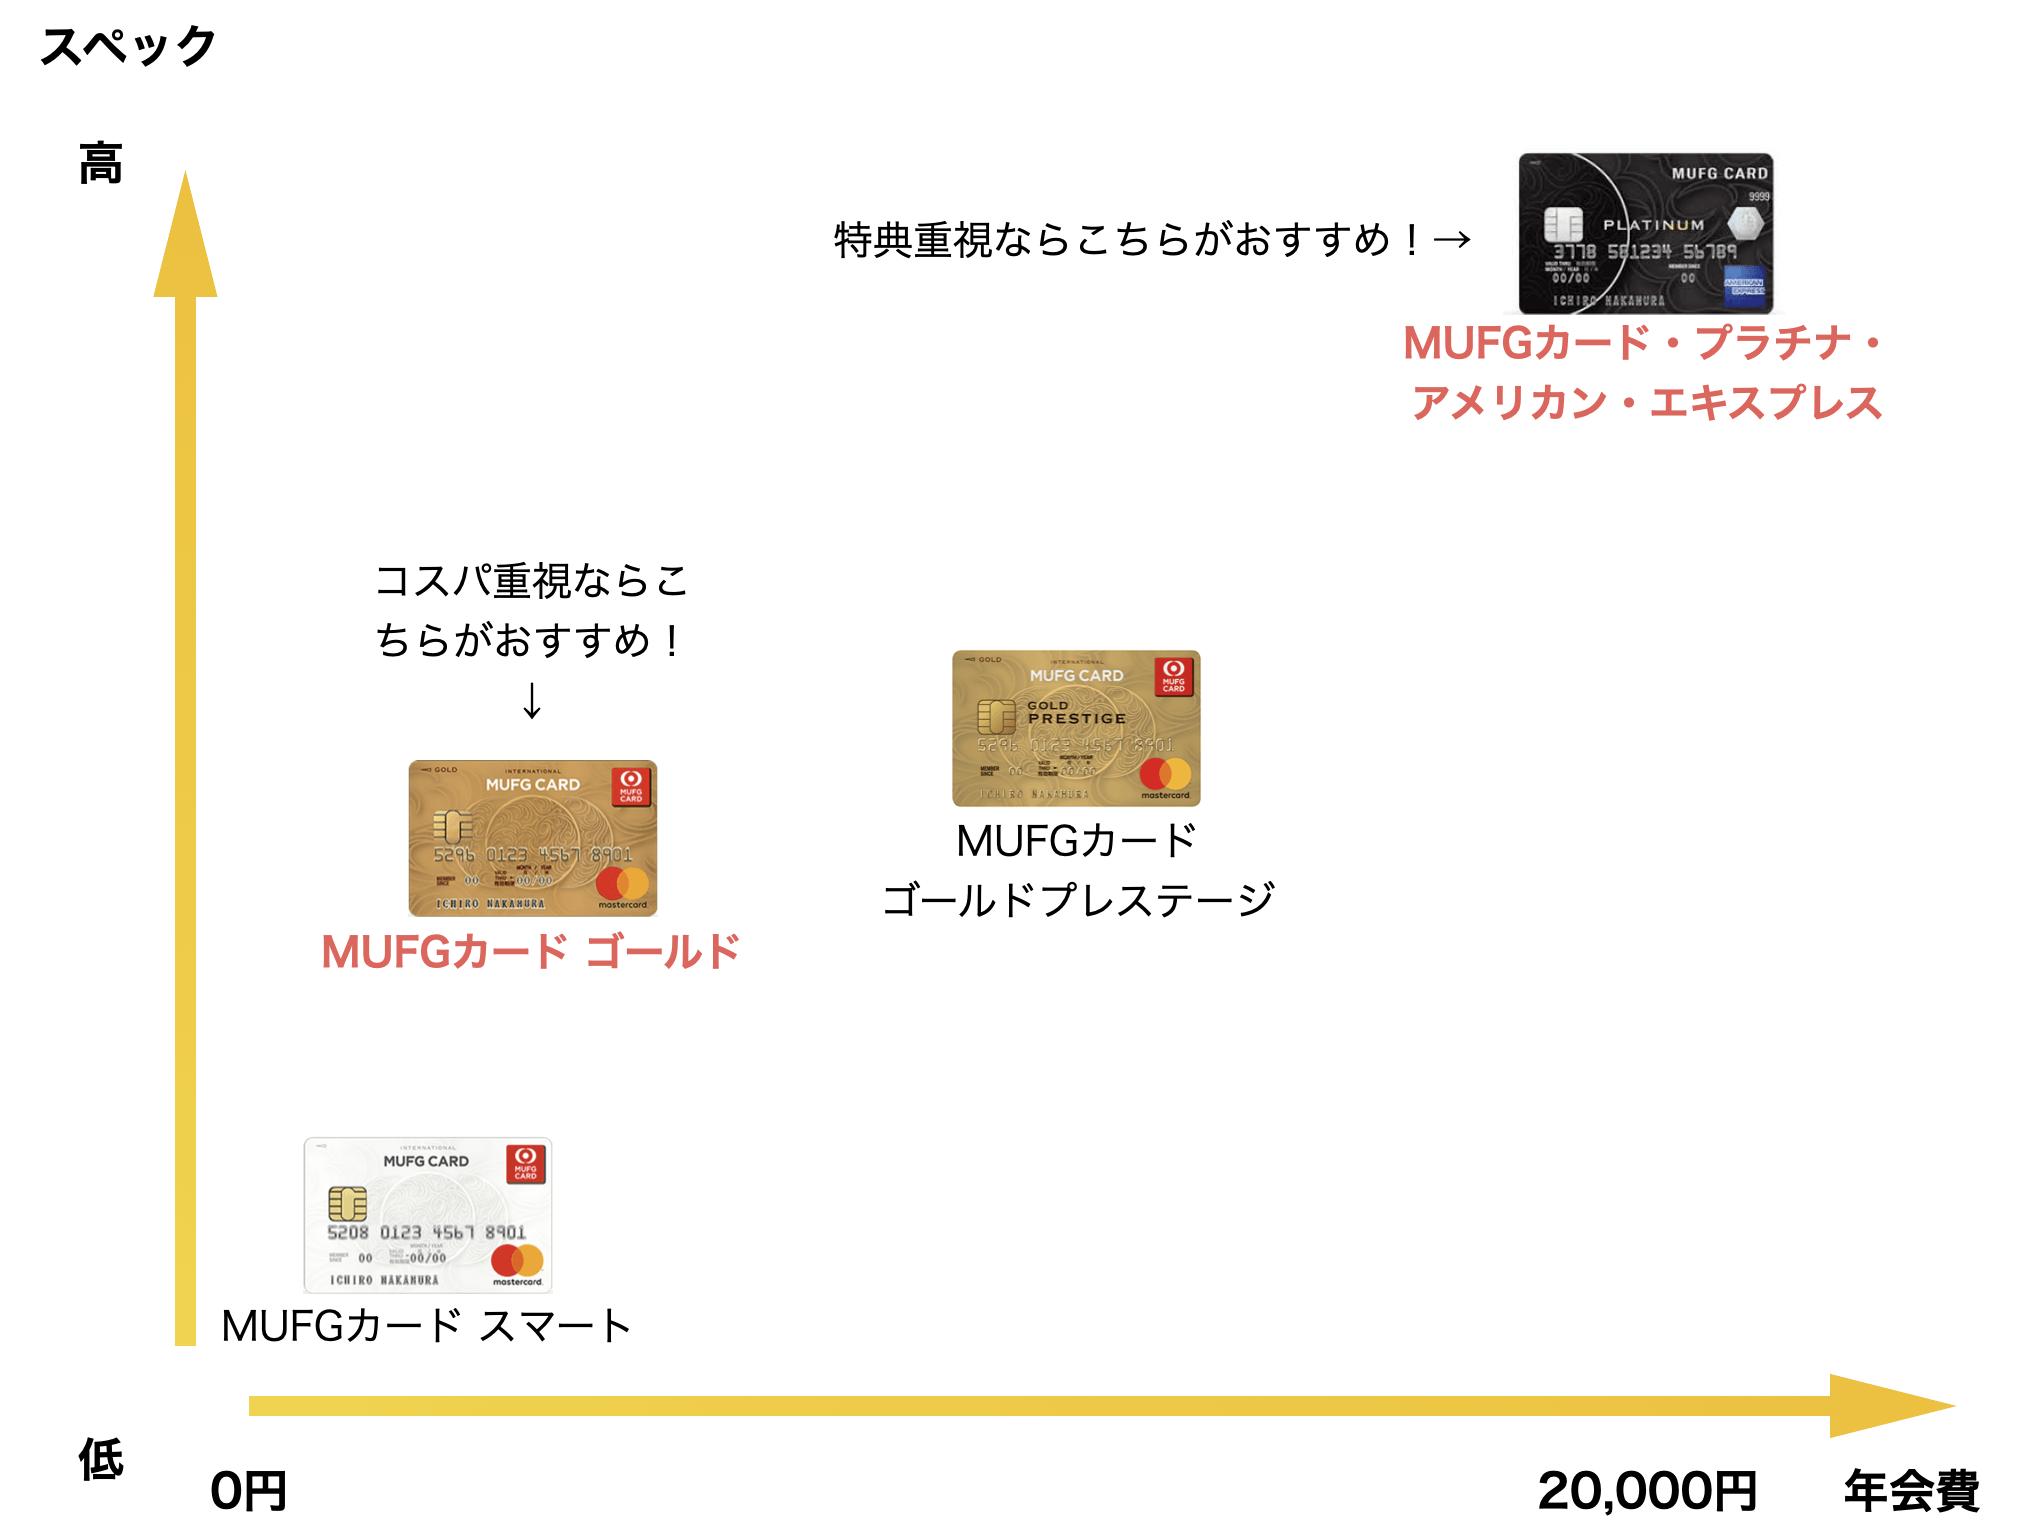 MUFGカードのスペックと年会費比較図(新Mastercardロゴ券面)